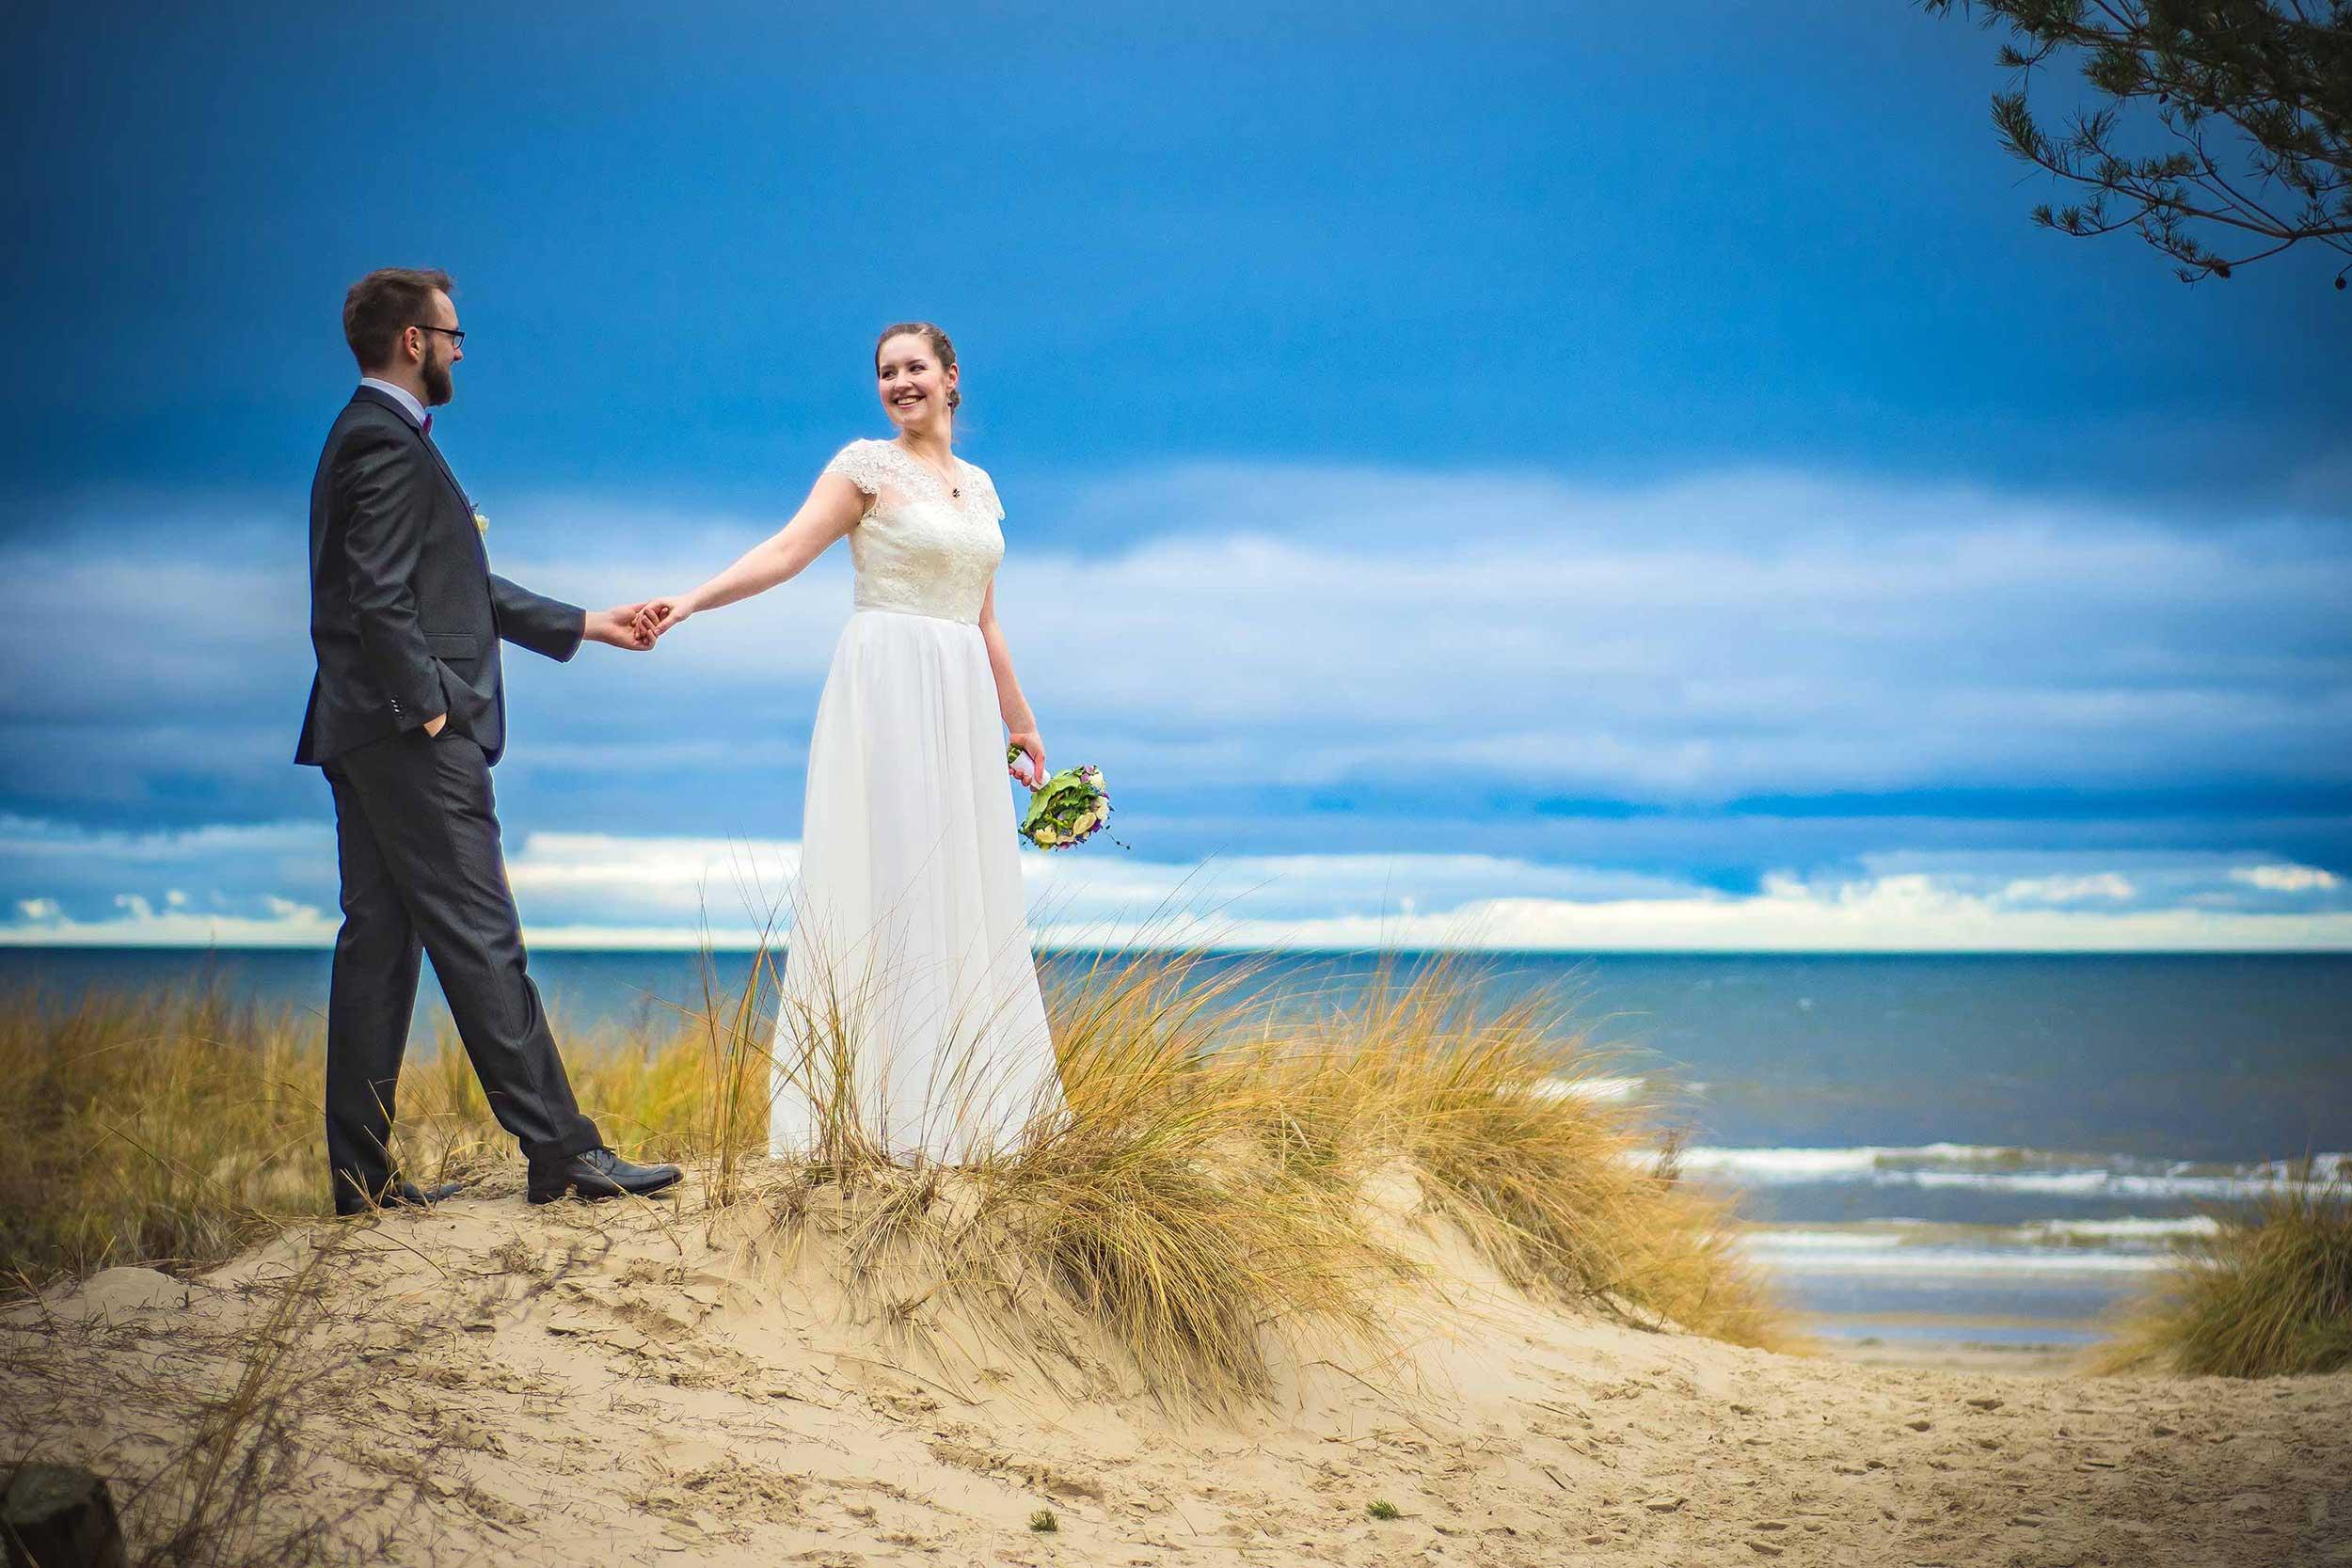 Hochzeitsfoto Strand lächeln Strandzugang